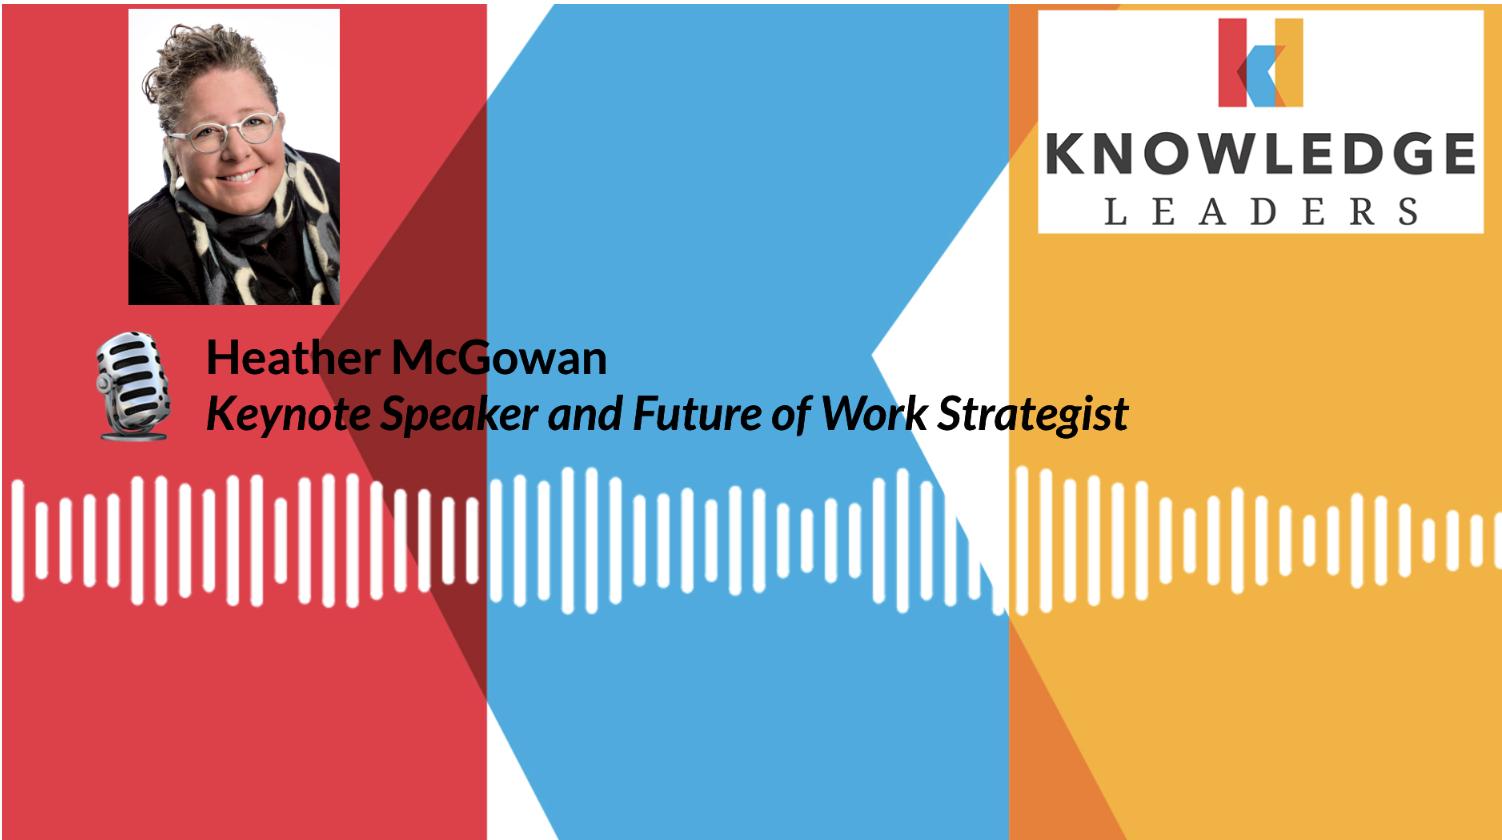 knowledge leaders McGowan